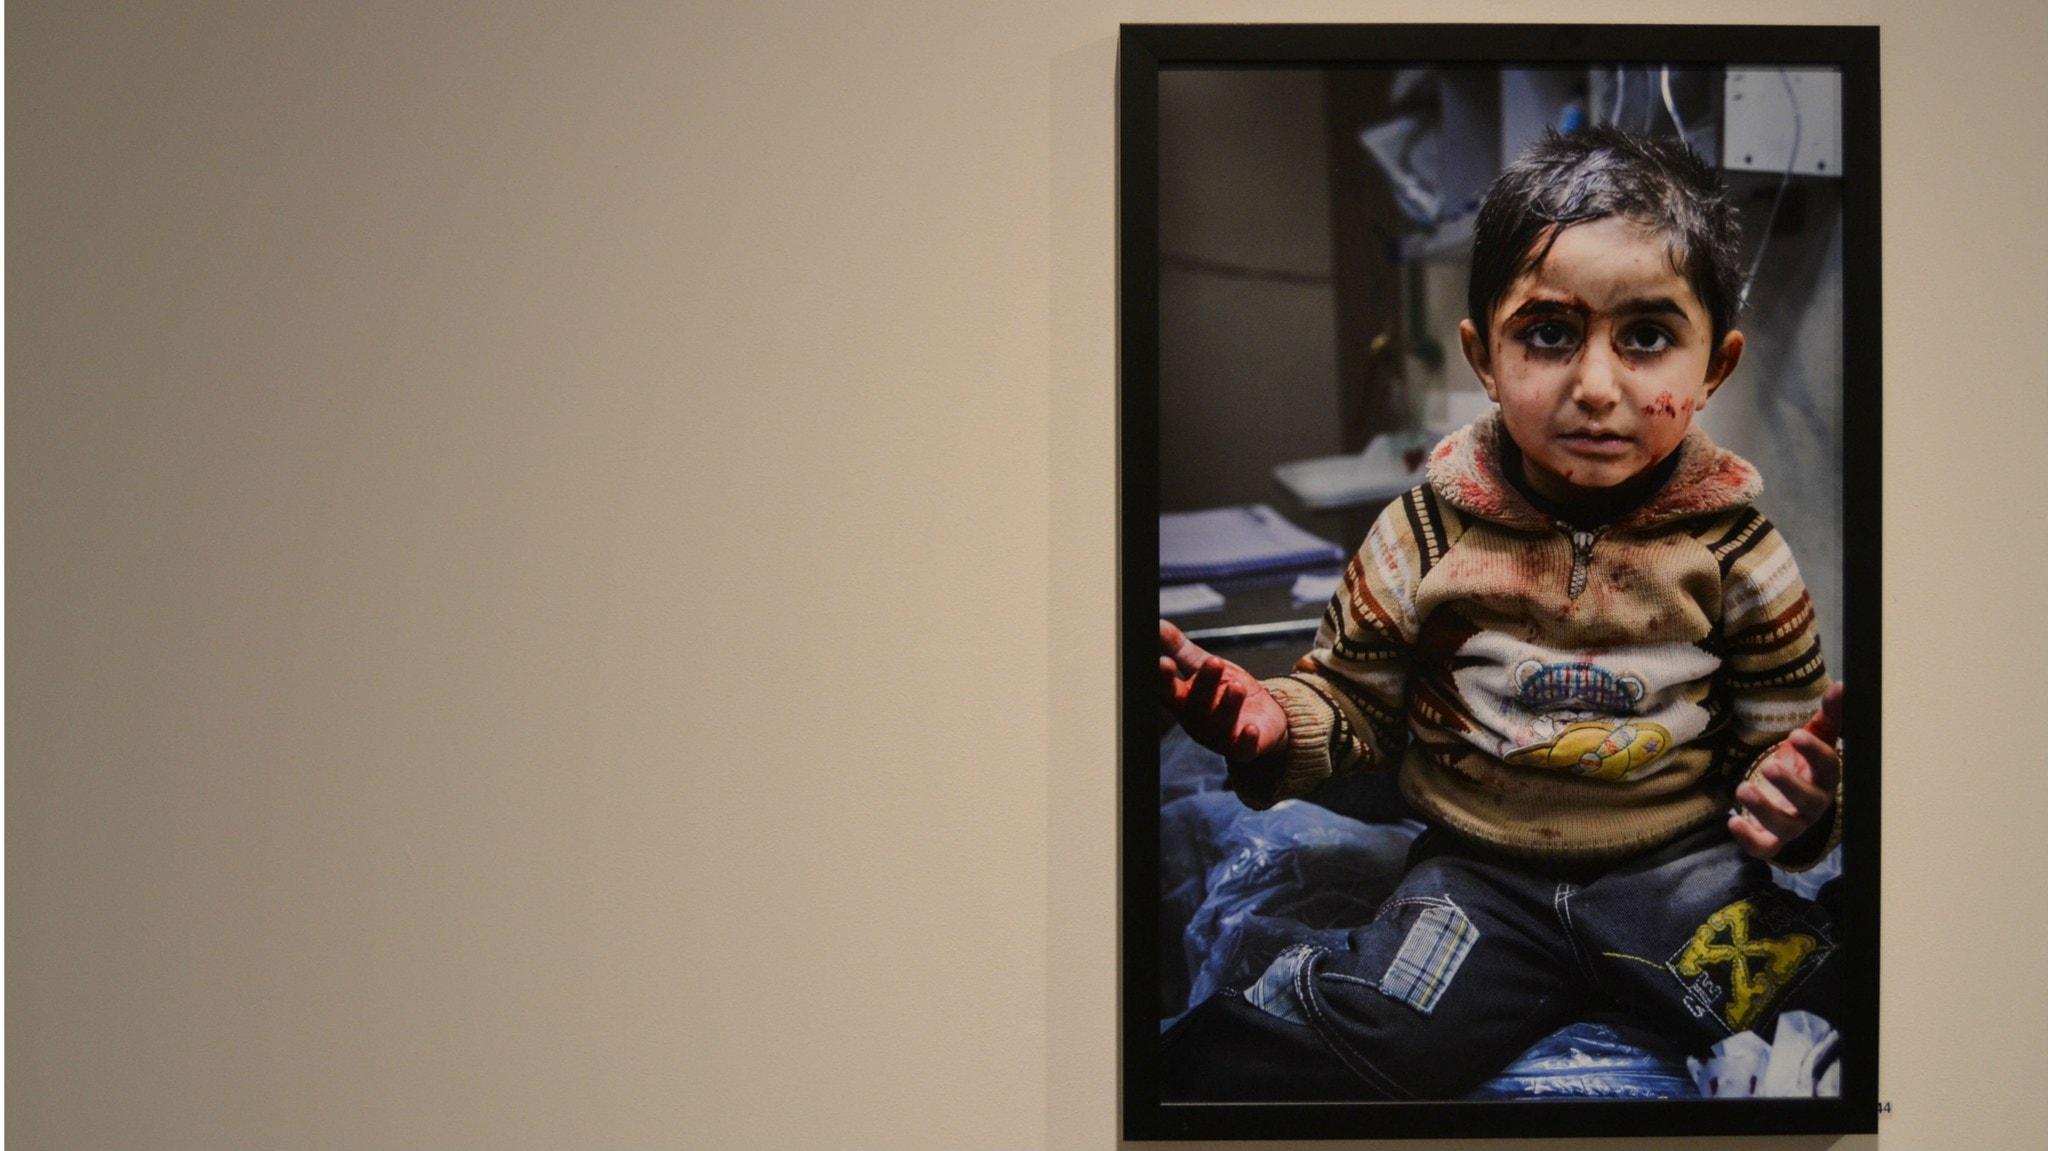 Starka bilder fran konflikthardar